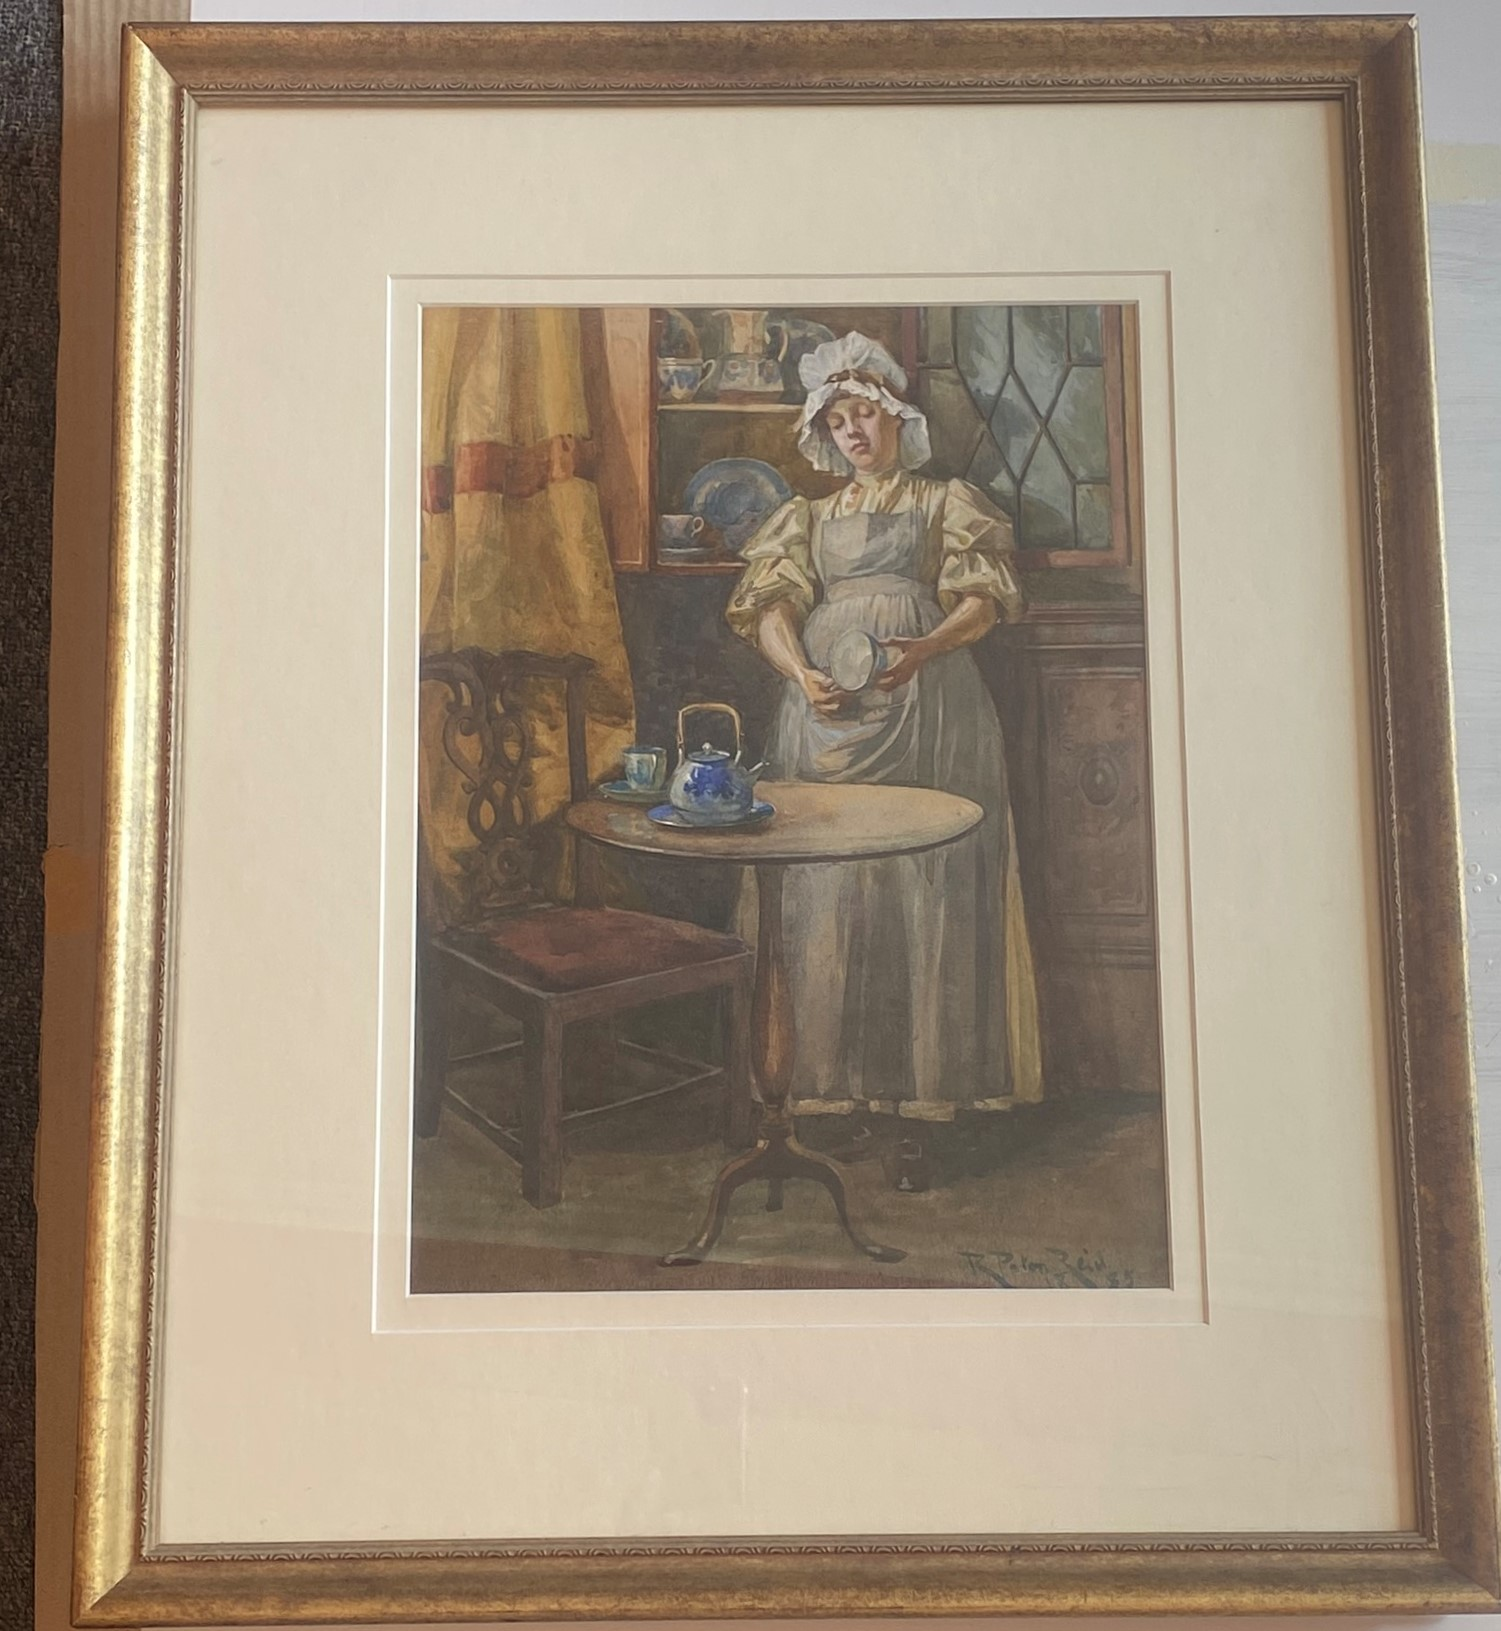 Original Signed Watercolour. Robert Paton Reid (1859 - 1945) - The Kitchen Maid - Image 2 of 3